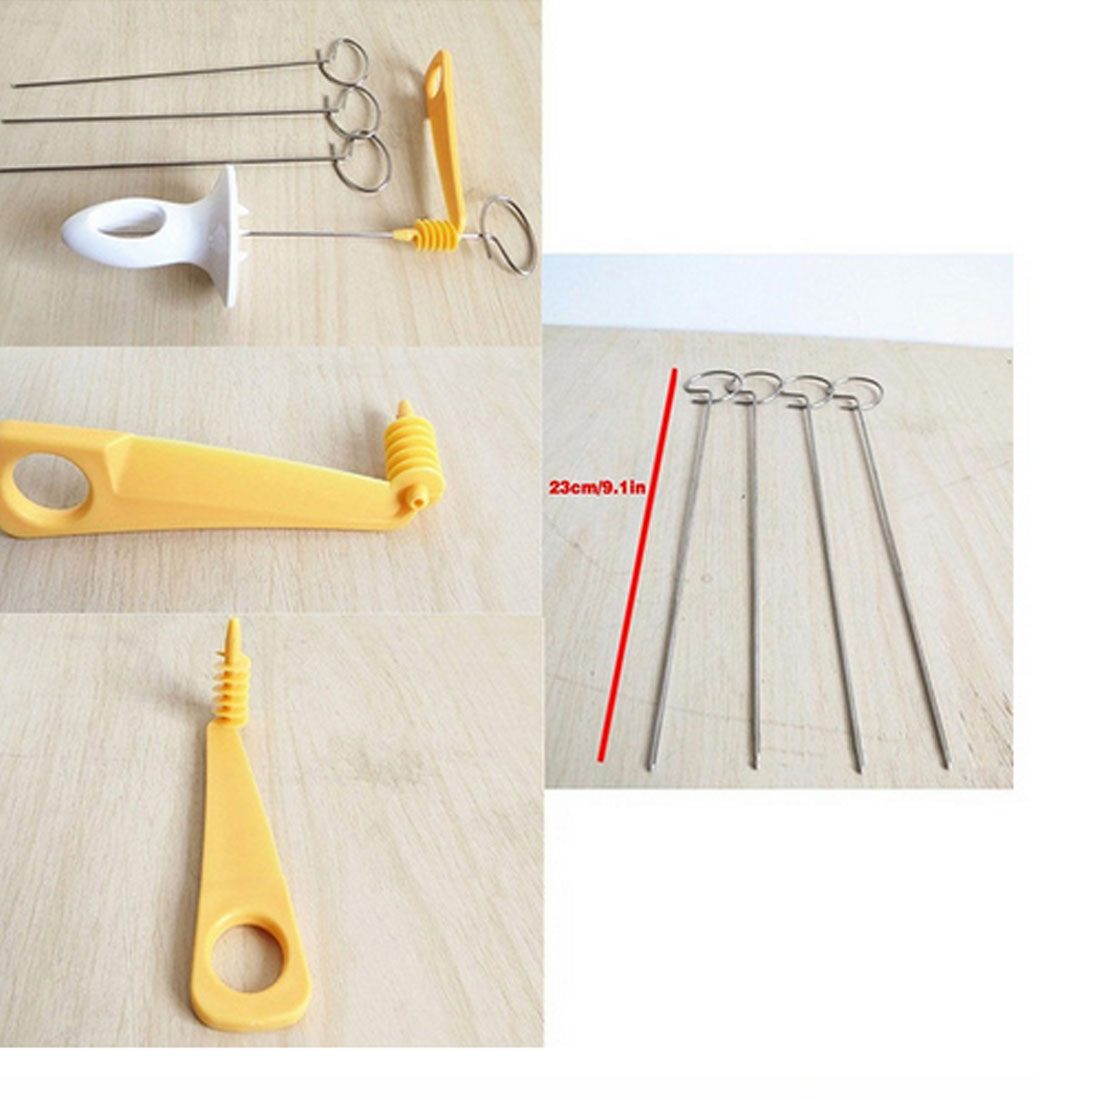 New Kitchen Accessories Tornado Potato Spiral Cutter Slicer Home Potato Making Twist Shredder Cooking Tools